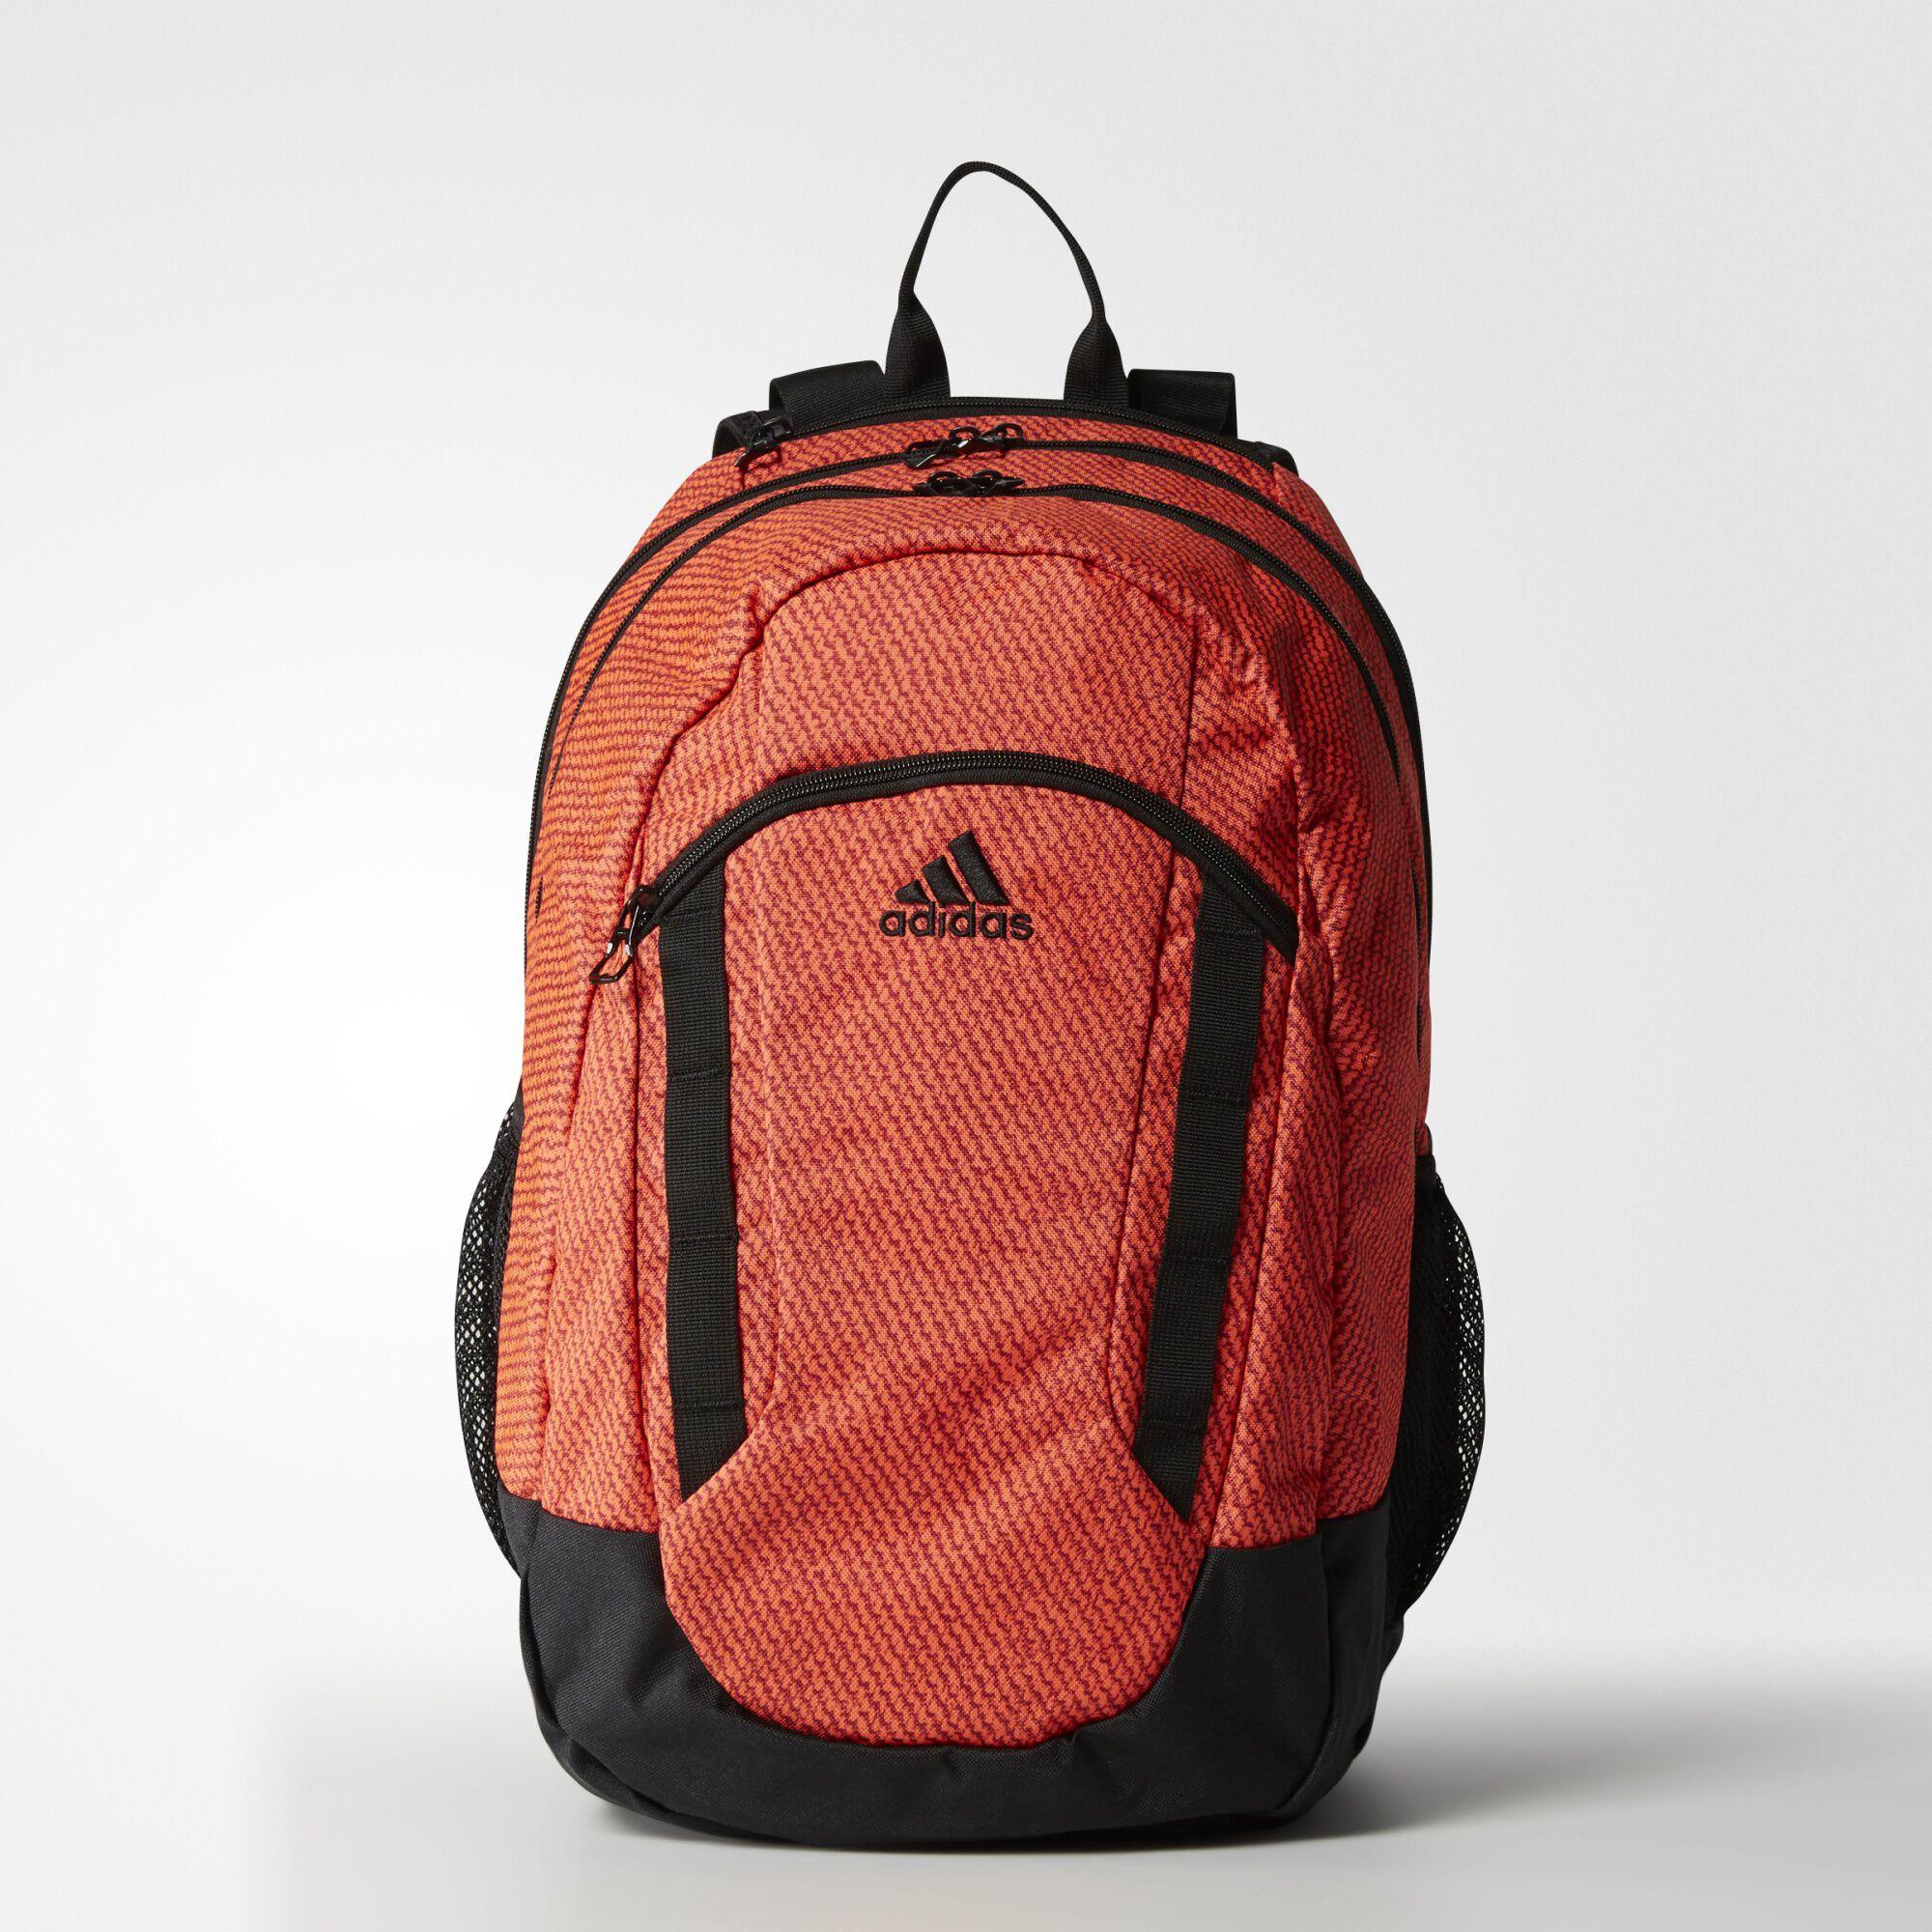 05e9b2e71277 Buy adidas bookbag brown   OFF69% Discounted